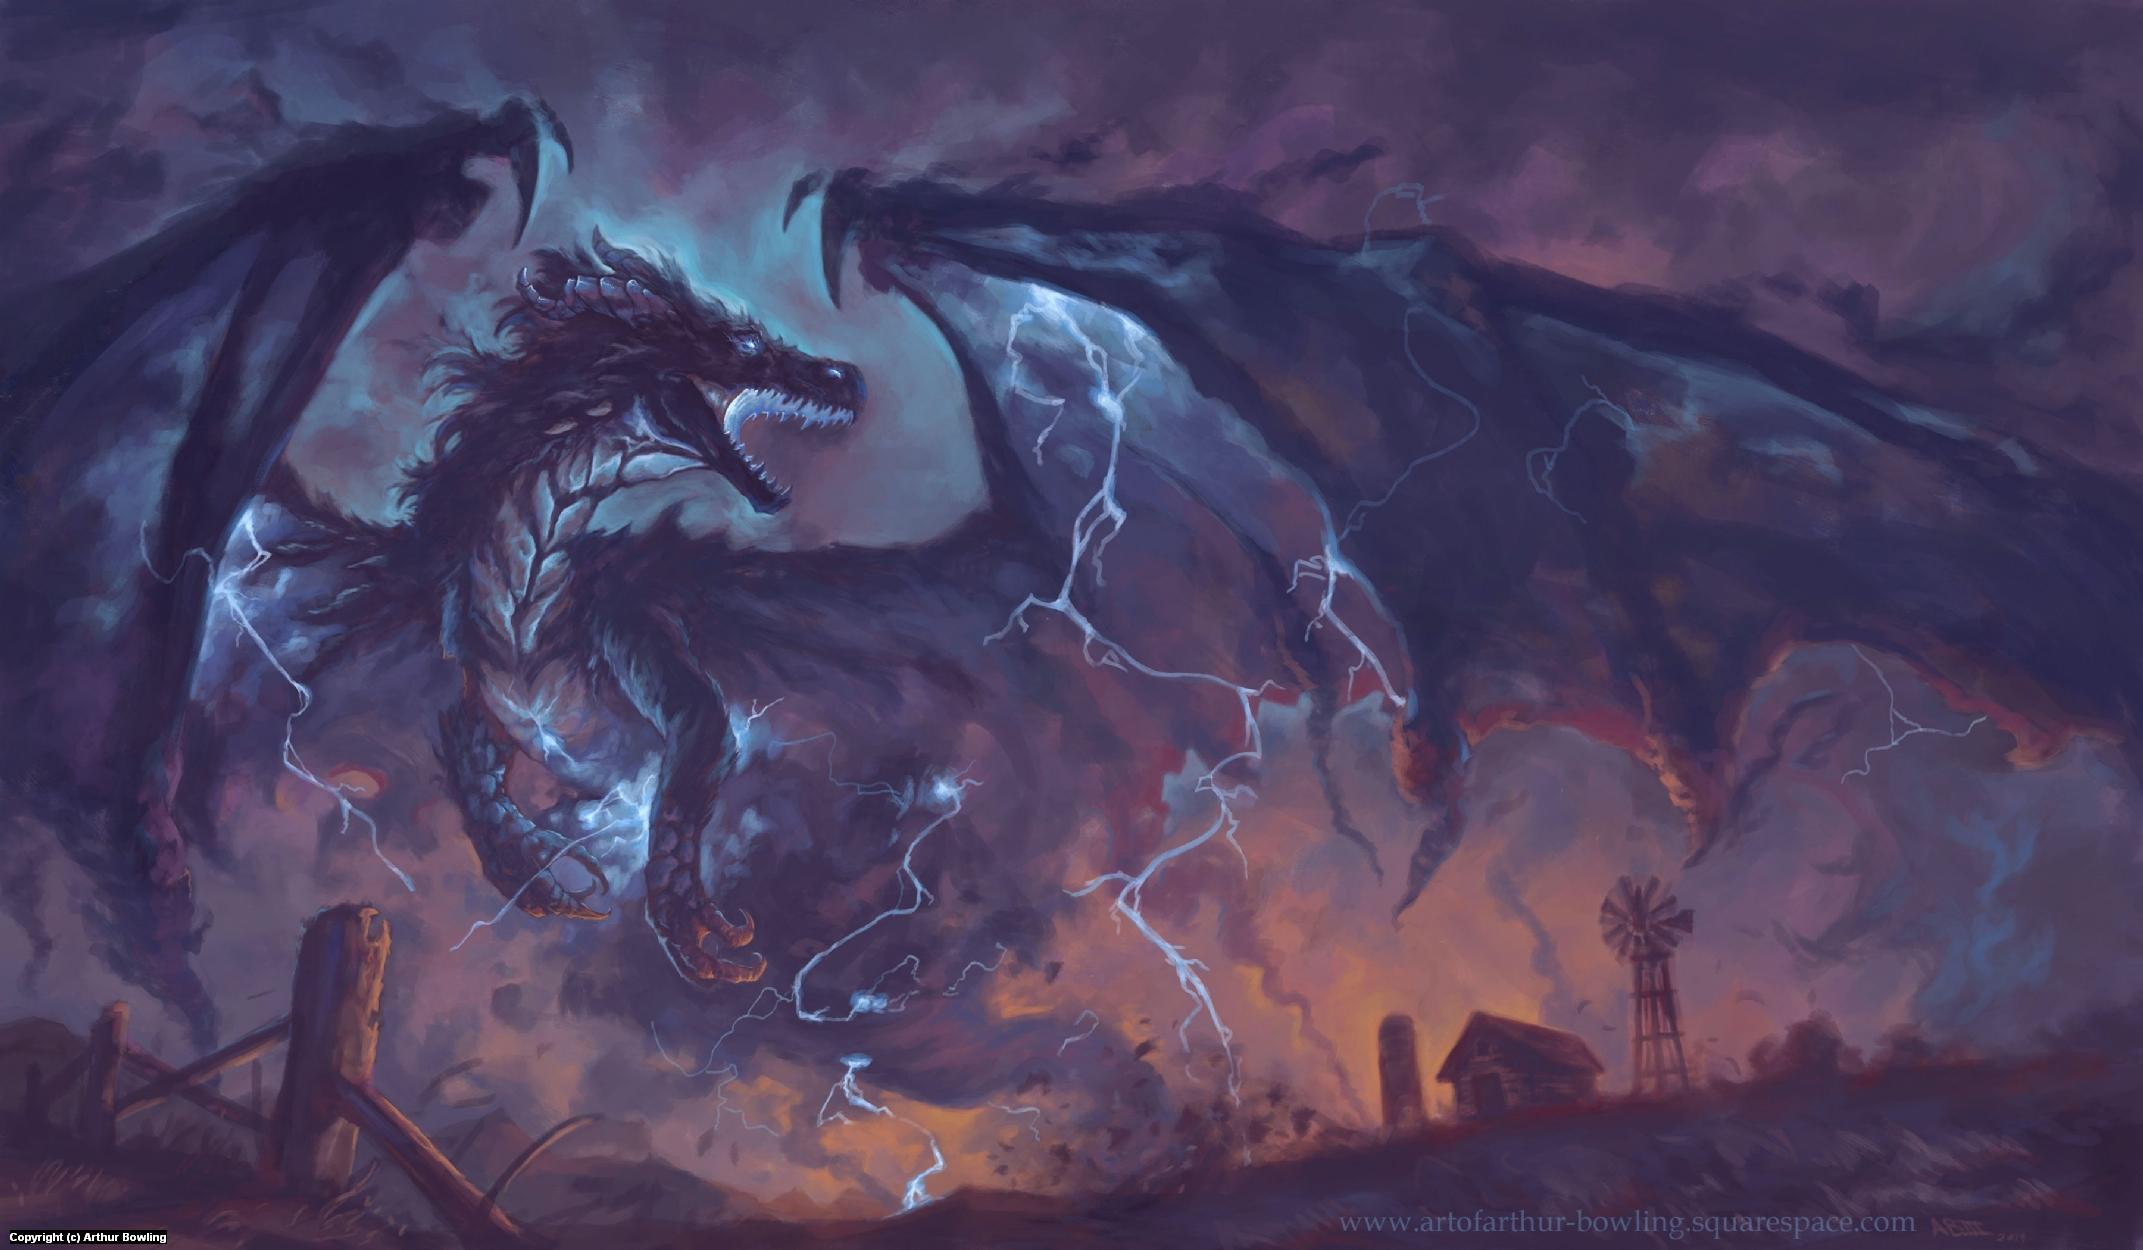 Storm Born Dragon Artwork by Arthur Bowling